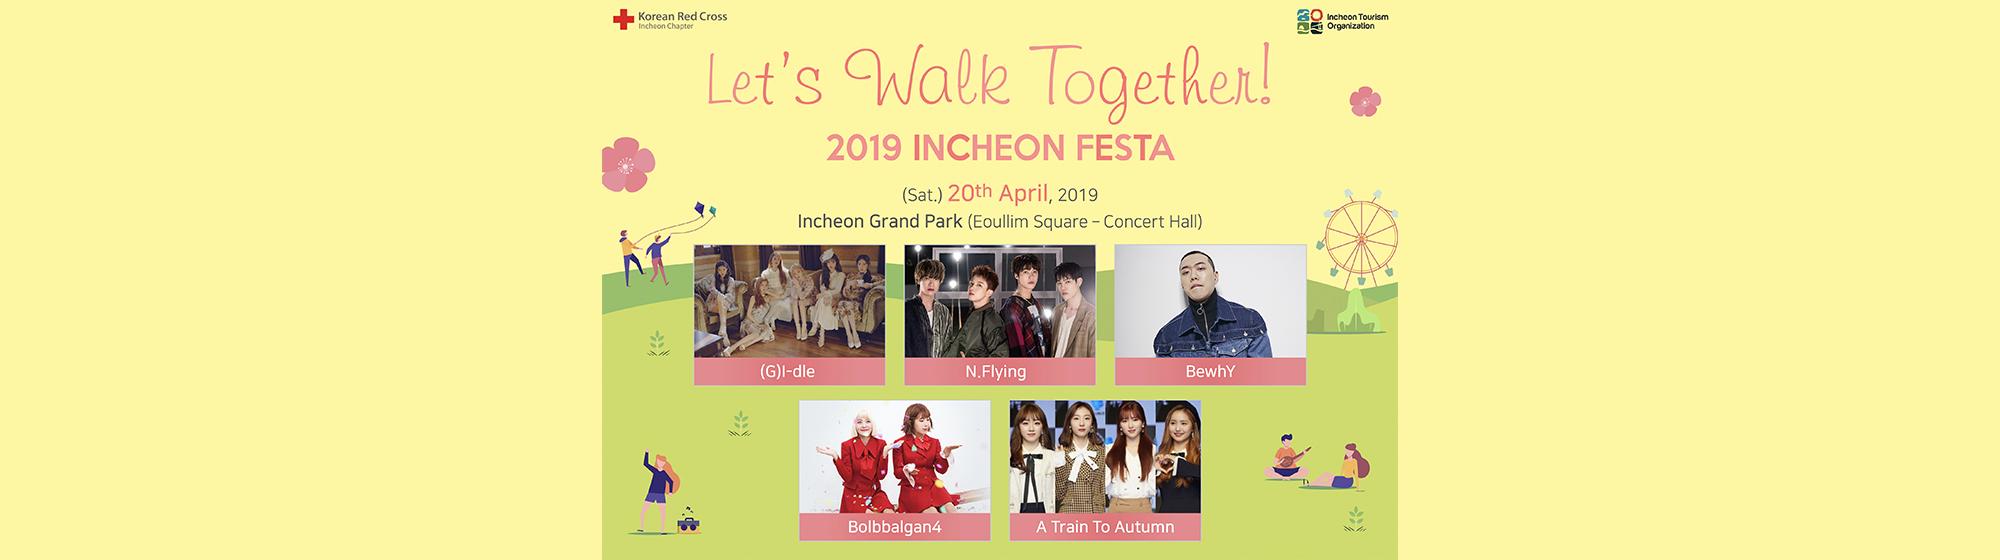 2019 let u0026 39 s walk together incheon kpop concert  u2013 april 20